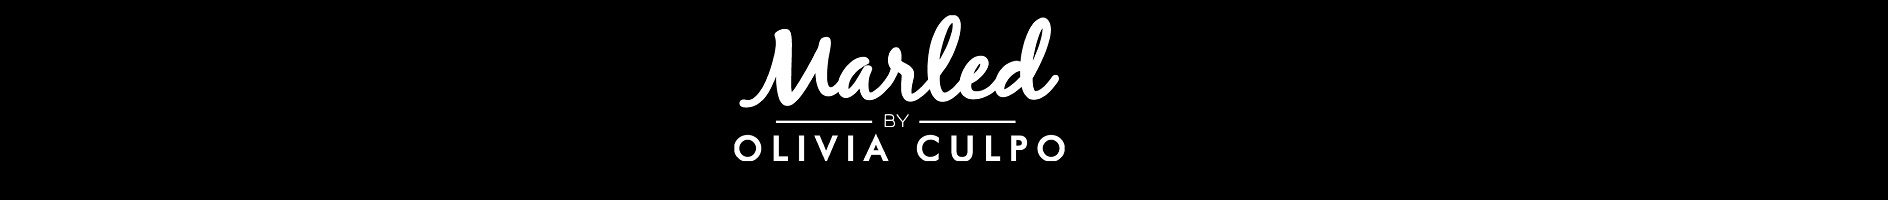 Marled by Olivia Culpo